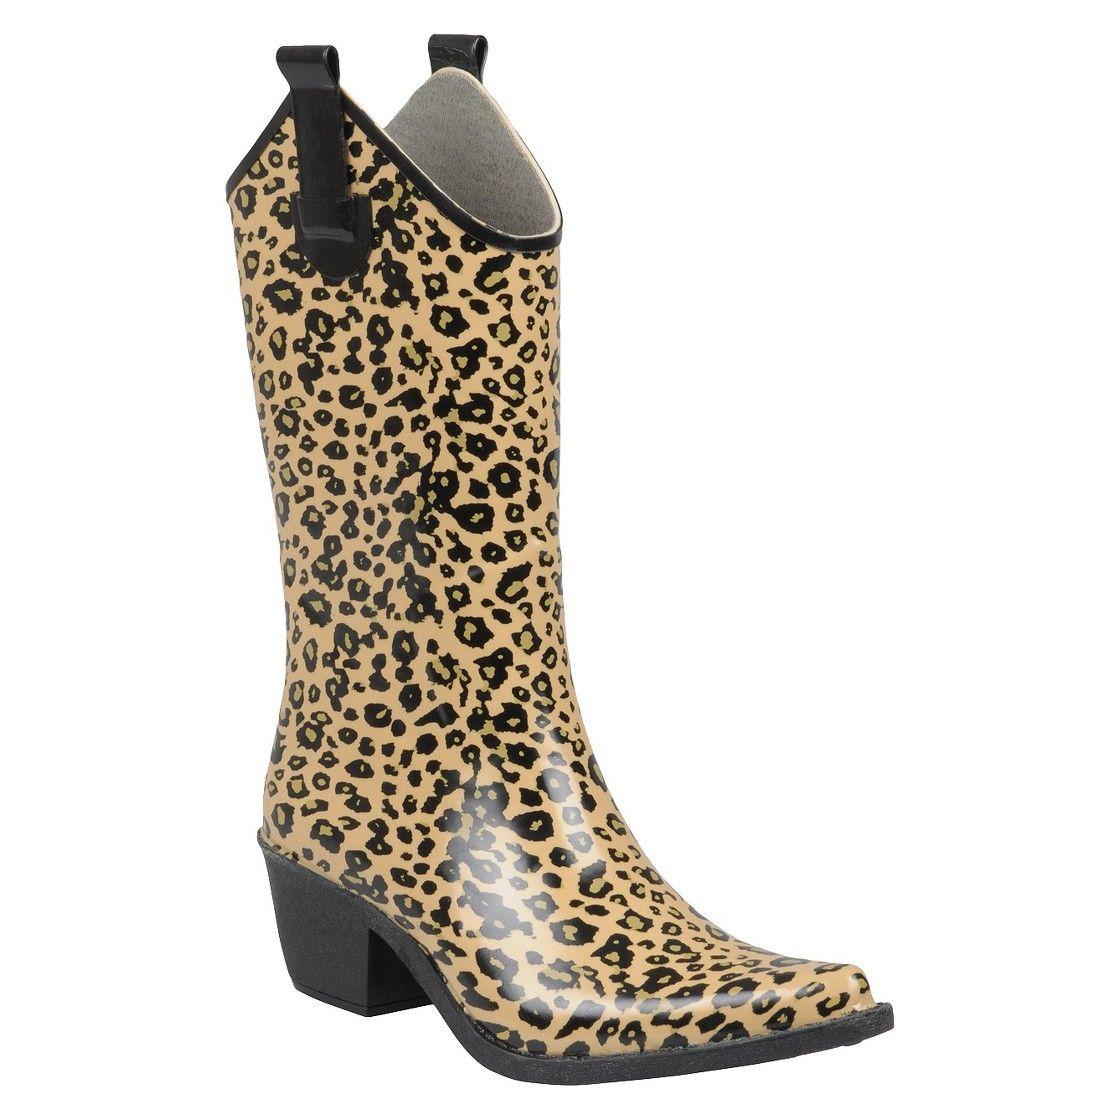 b9a288bcb89 Women's Leopard Print Cowboy Rainboots - Tan | shoes | Cowboy rain ...